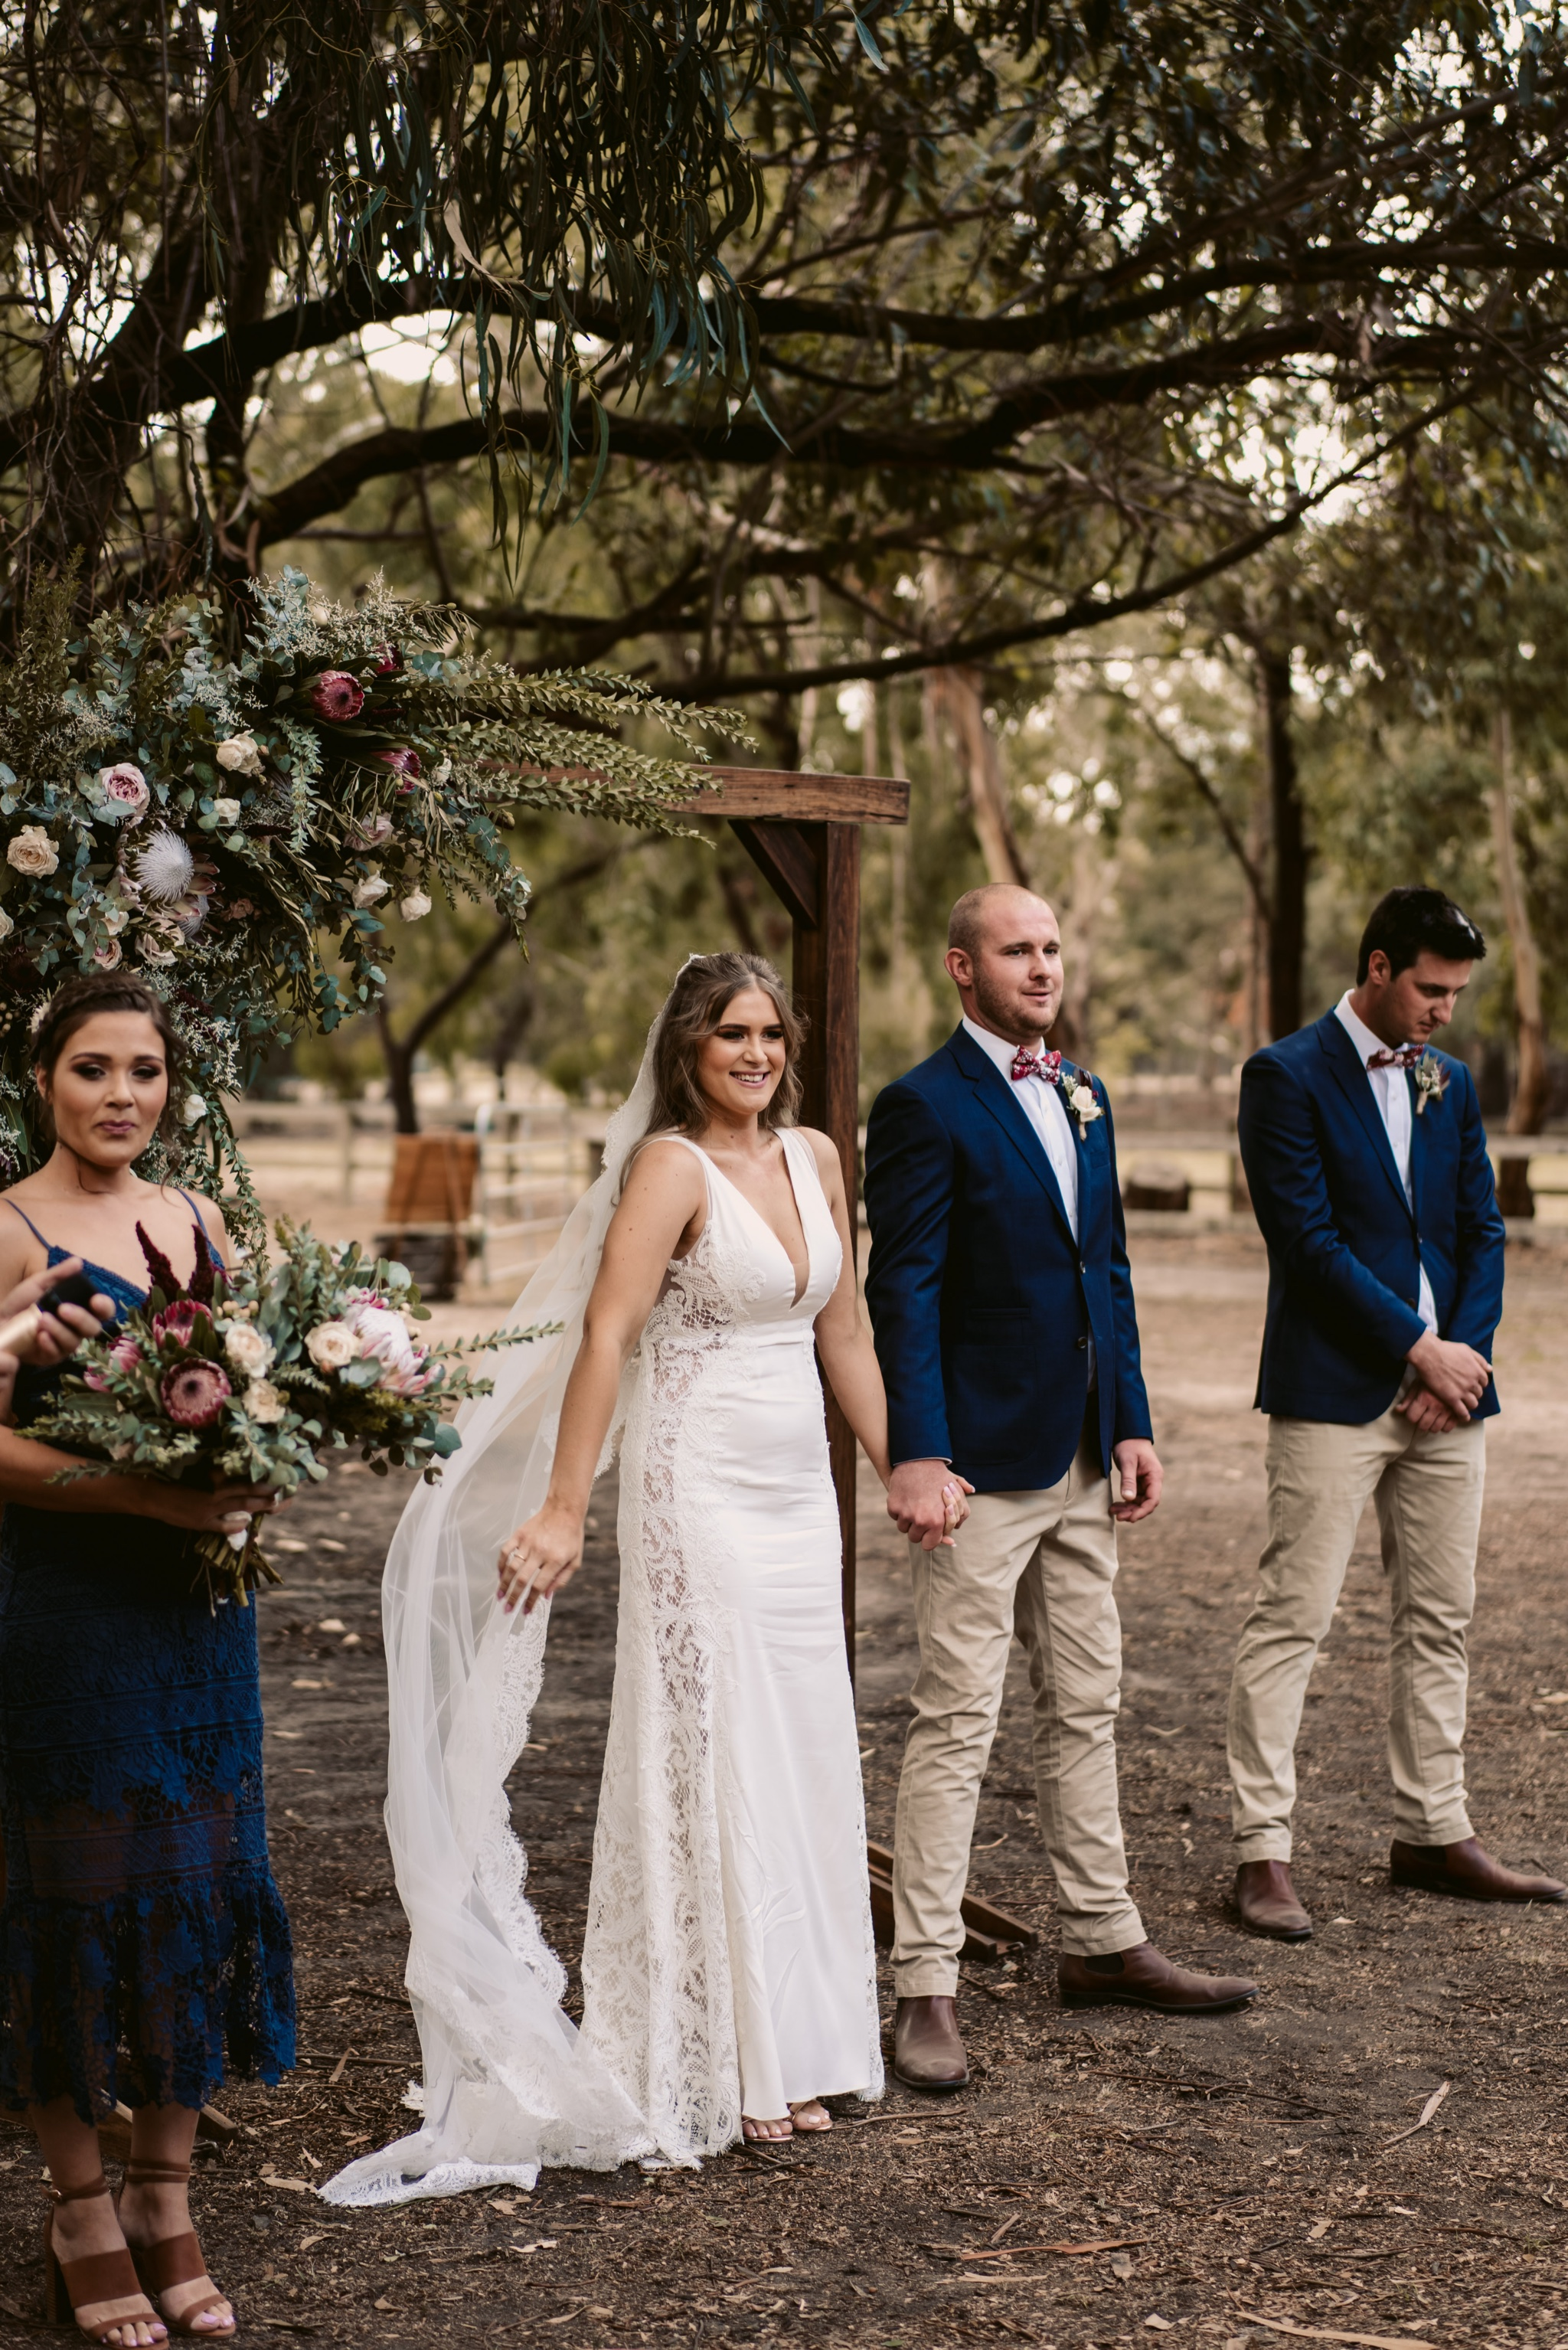 Mornington Peninsula Wedding Photography48.jpg